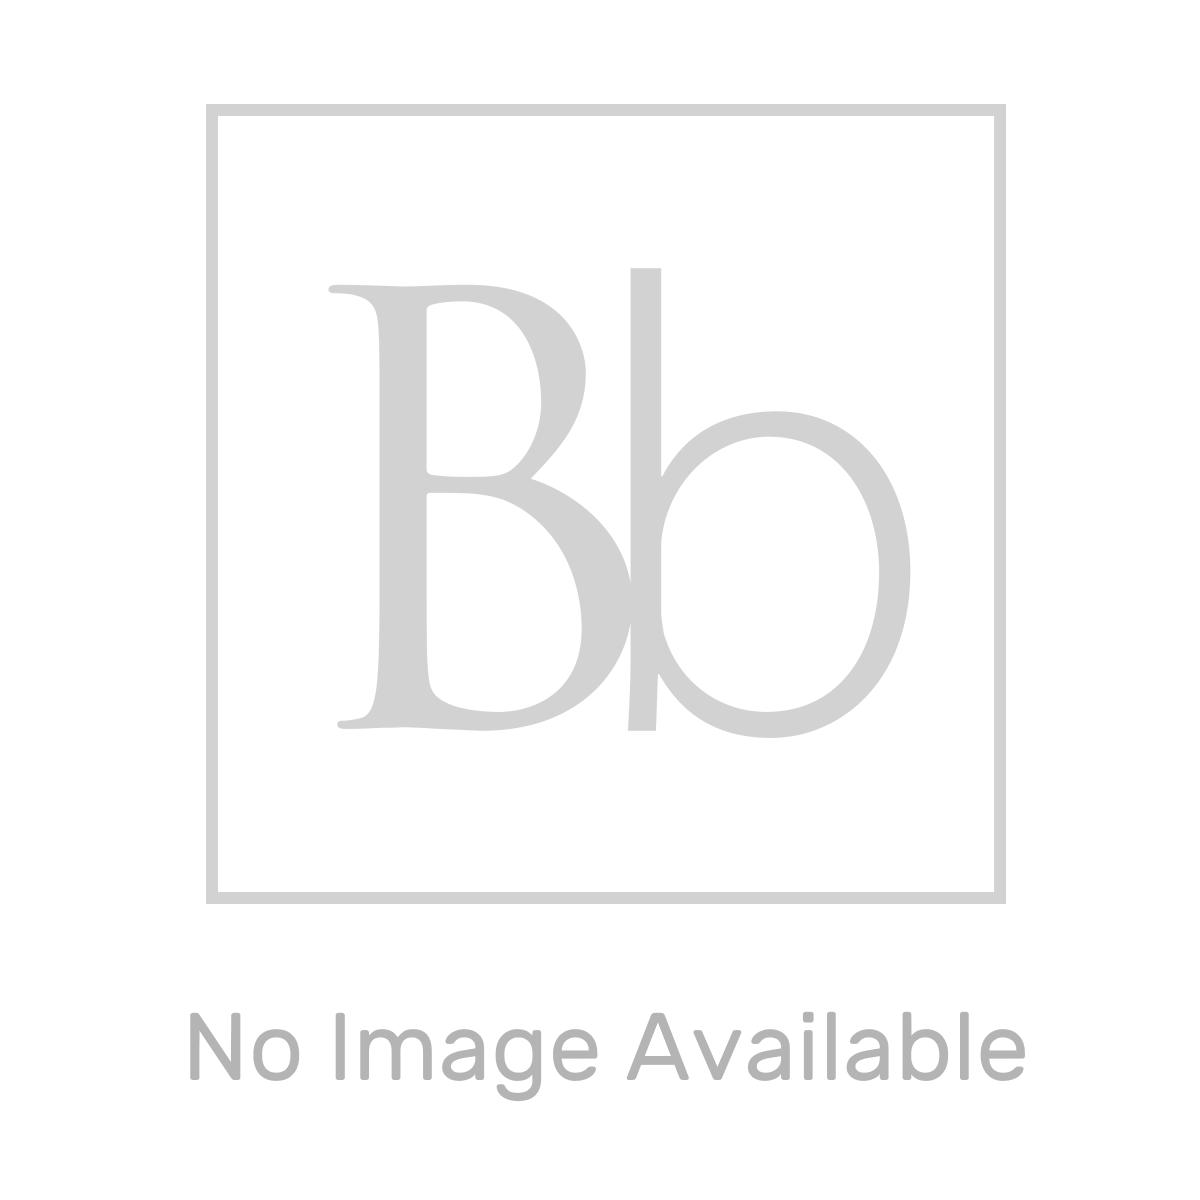 Aquadart Grey Slate Shower Tray 1200 x 700 Overhead